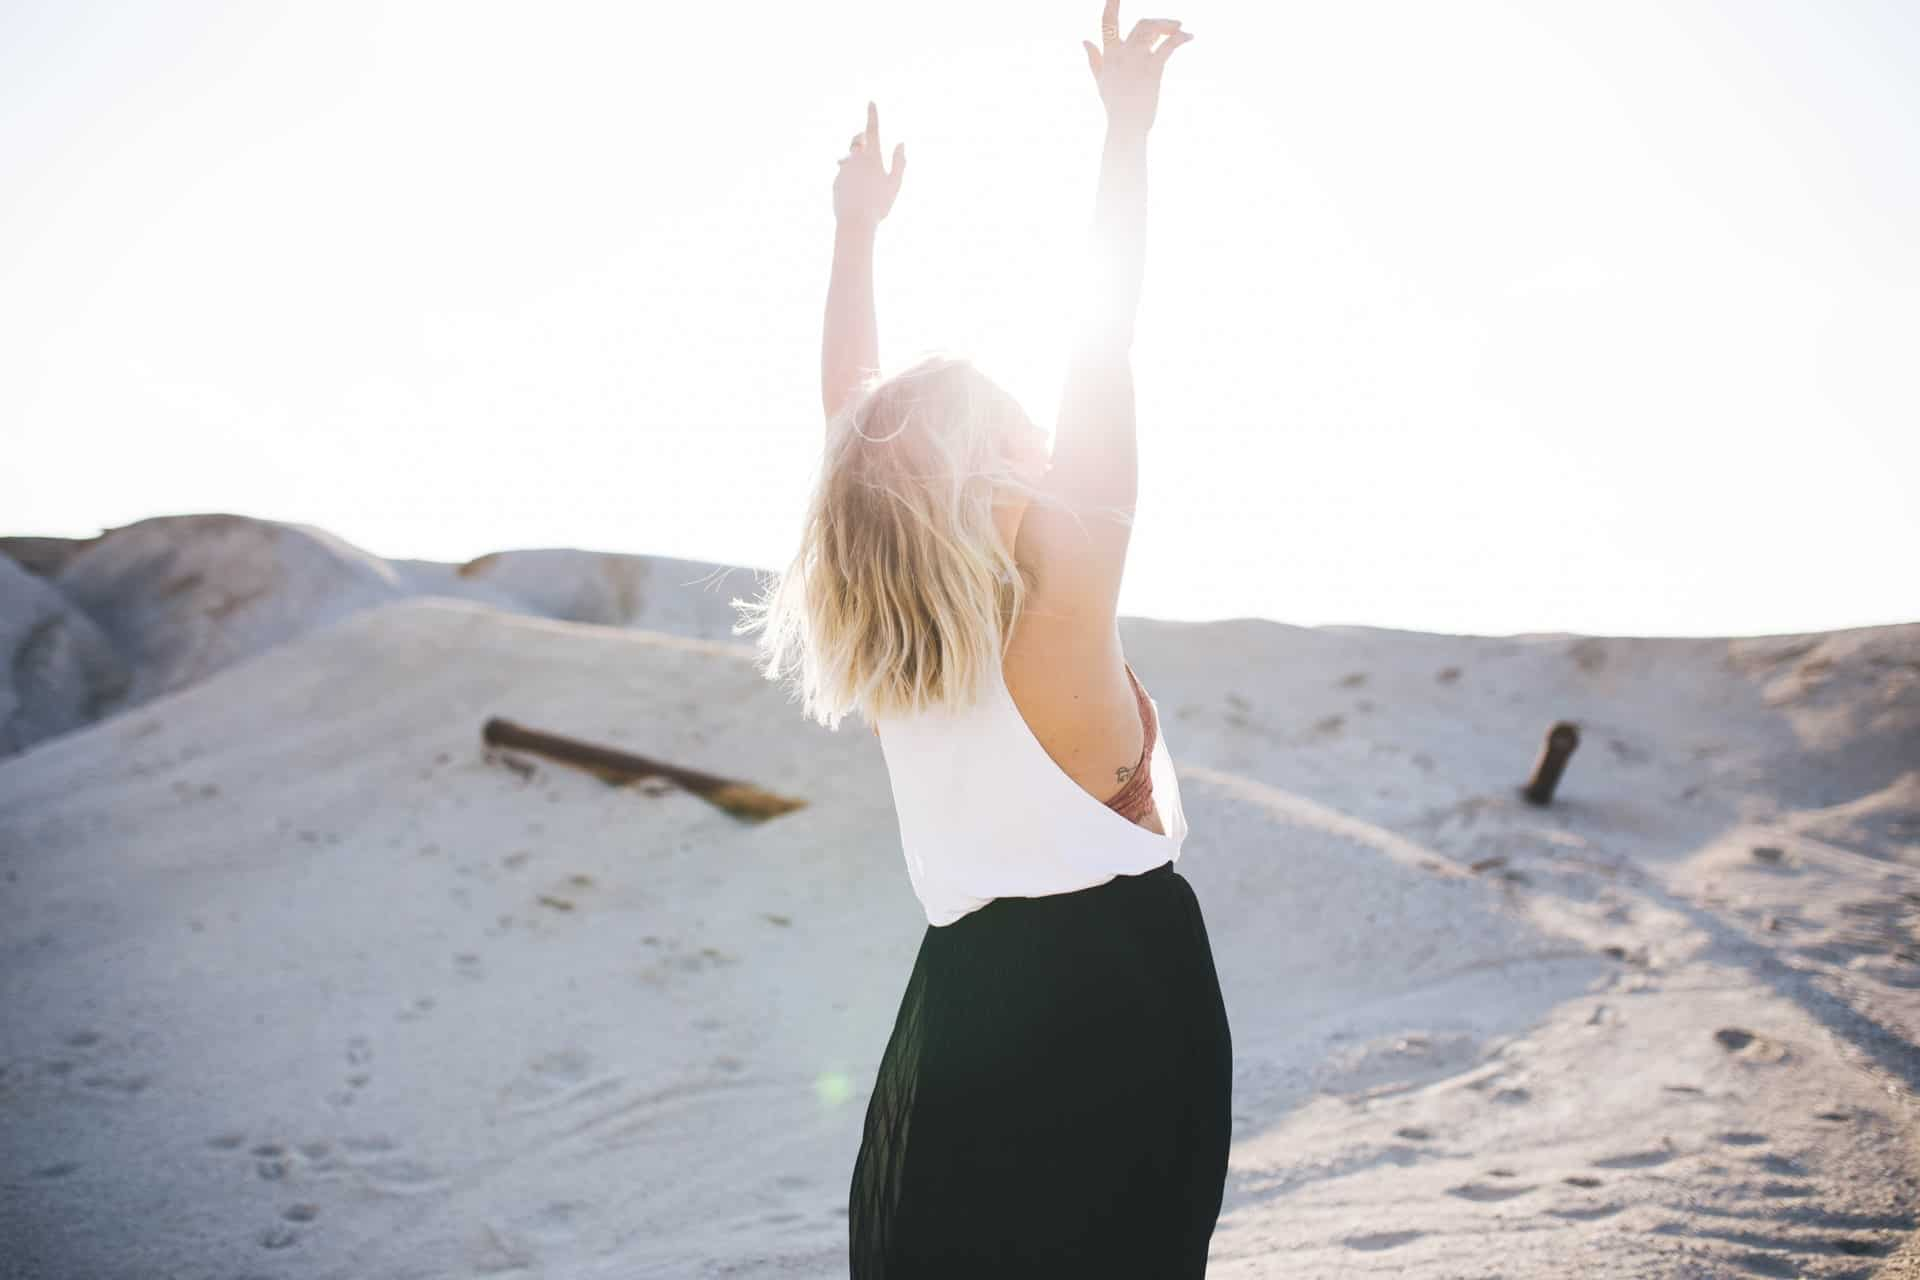 Die Frau genießt den Berg und hob die Hände